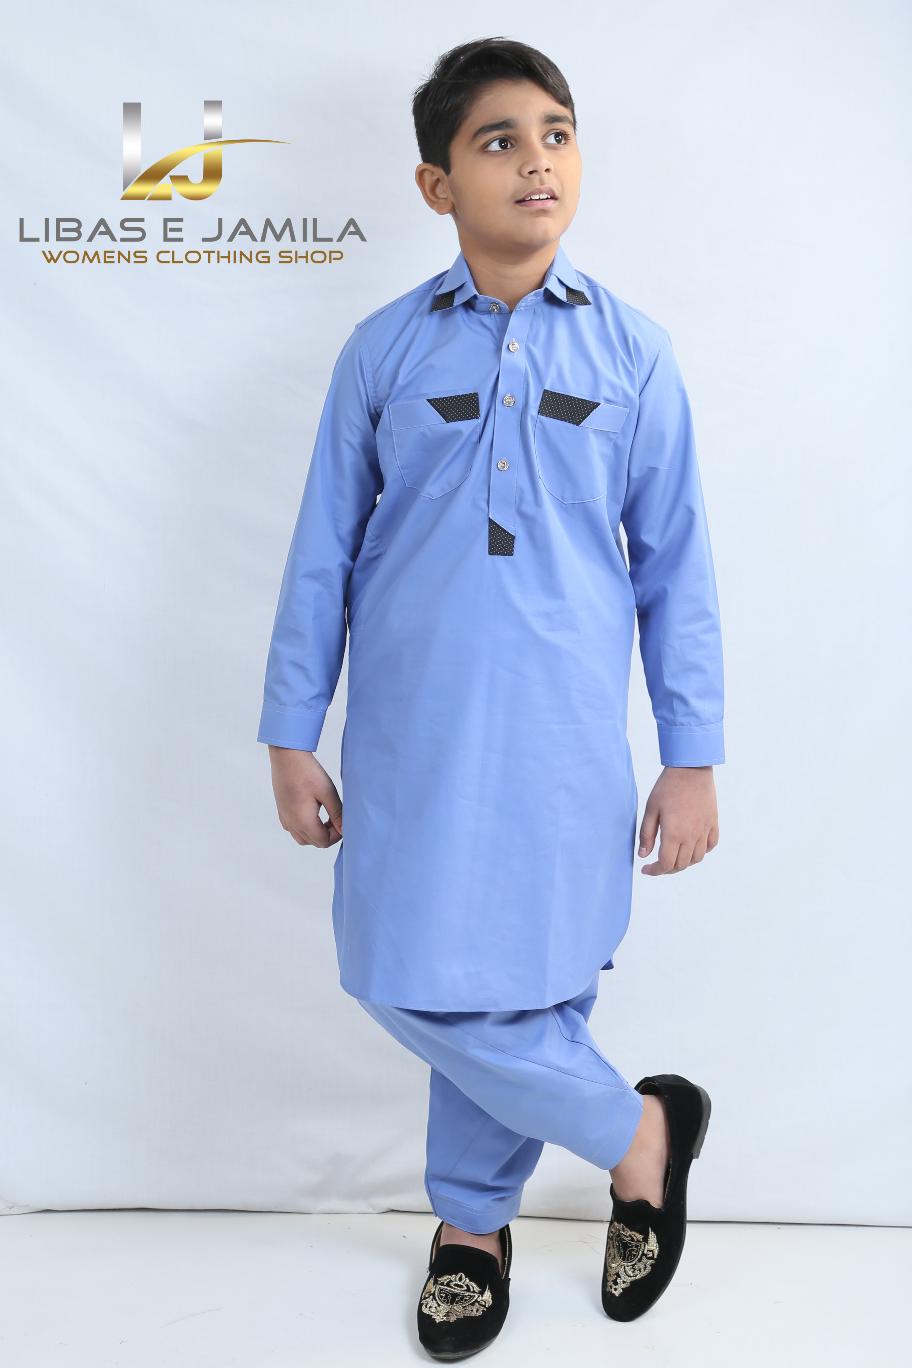 Best Quality Boys Shalwar Kameez for your Little Ones